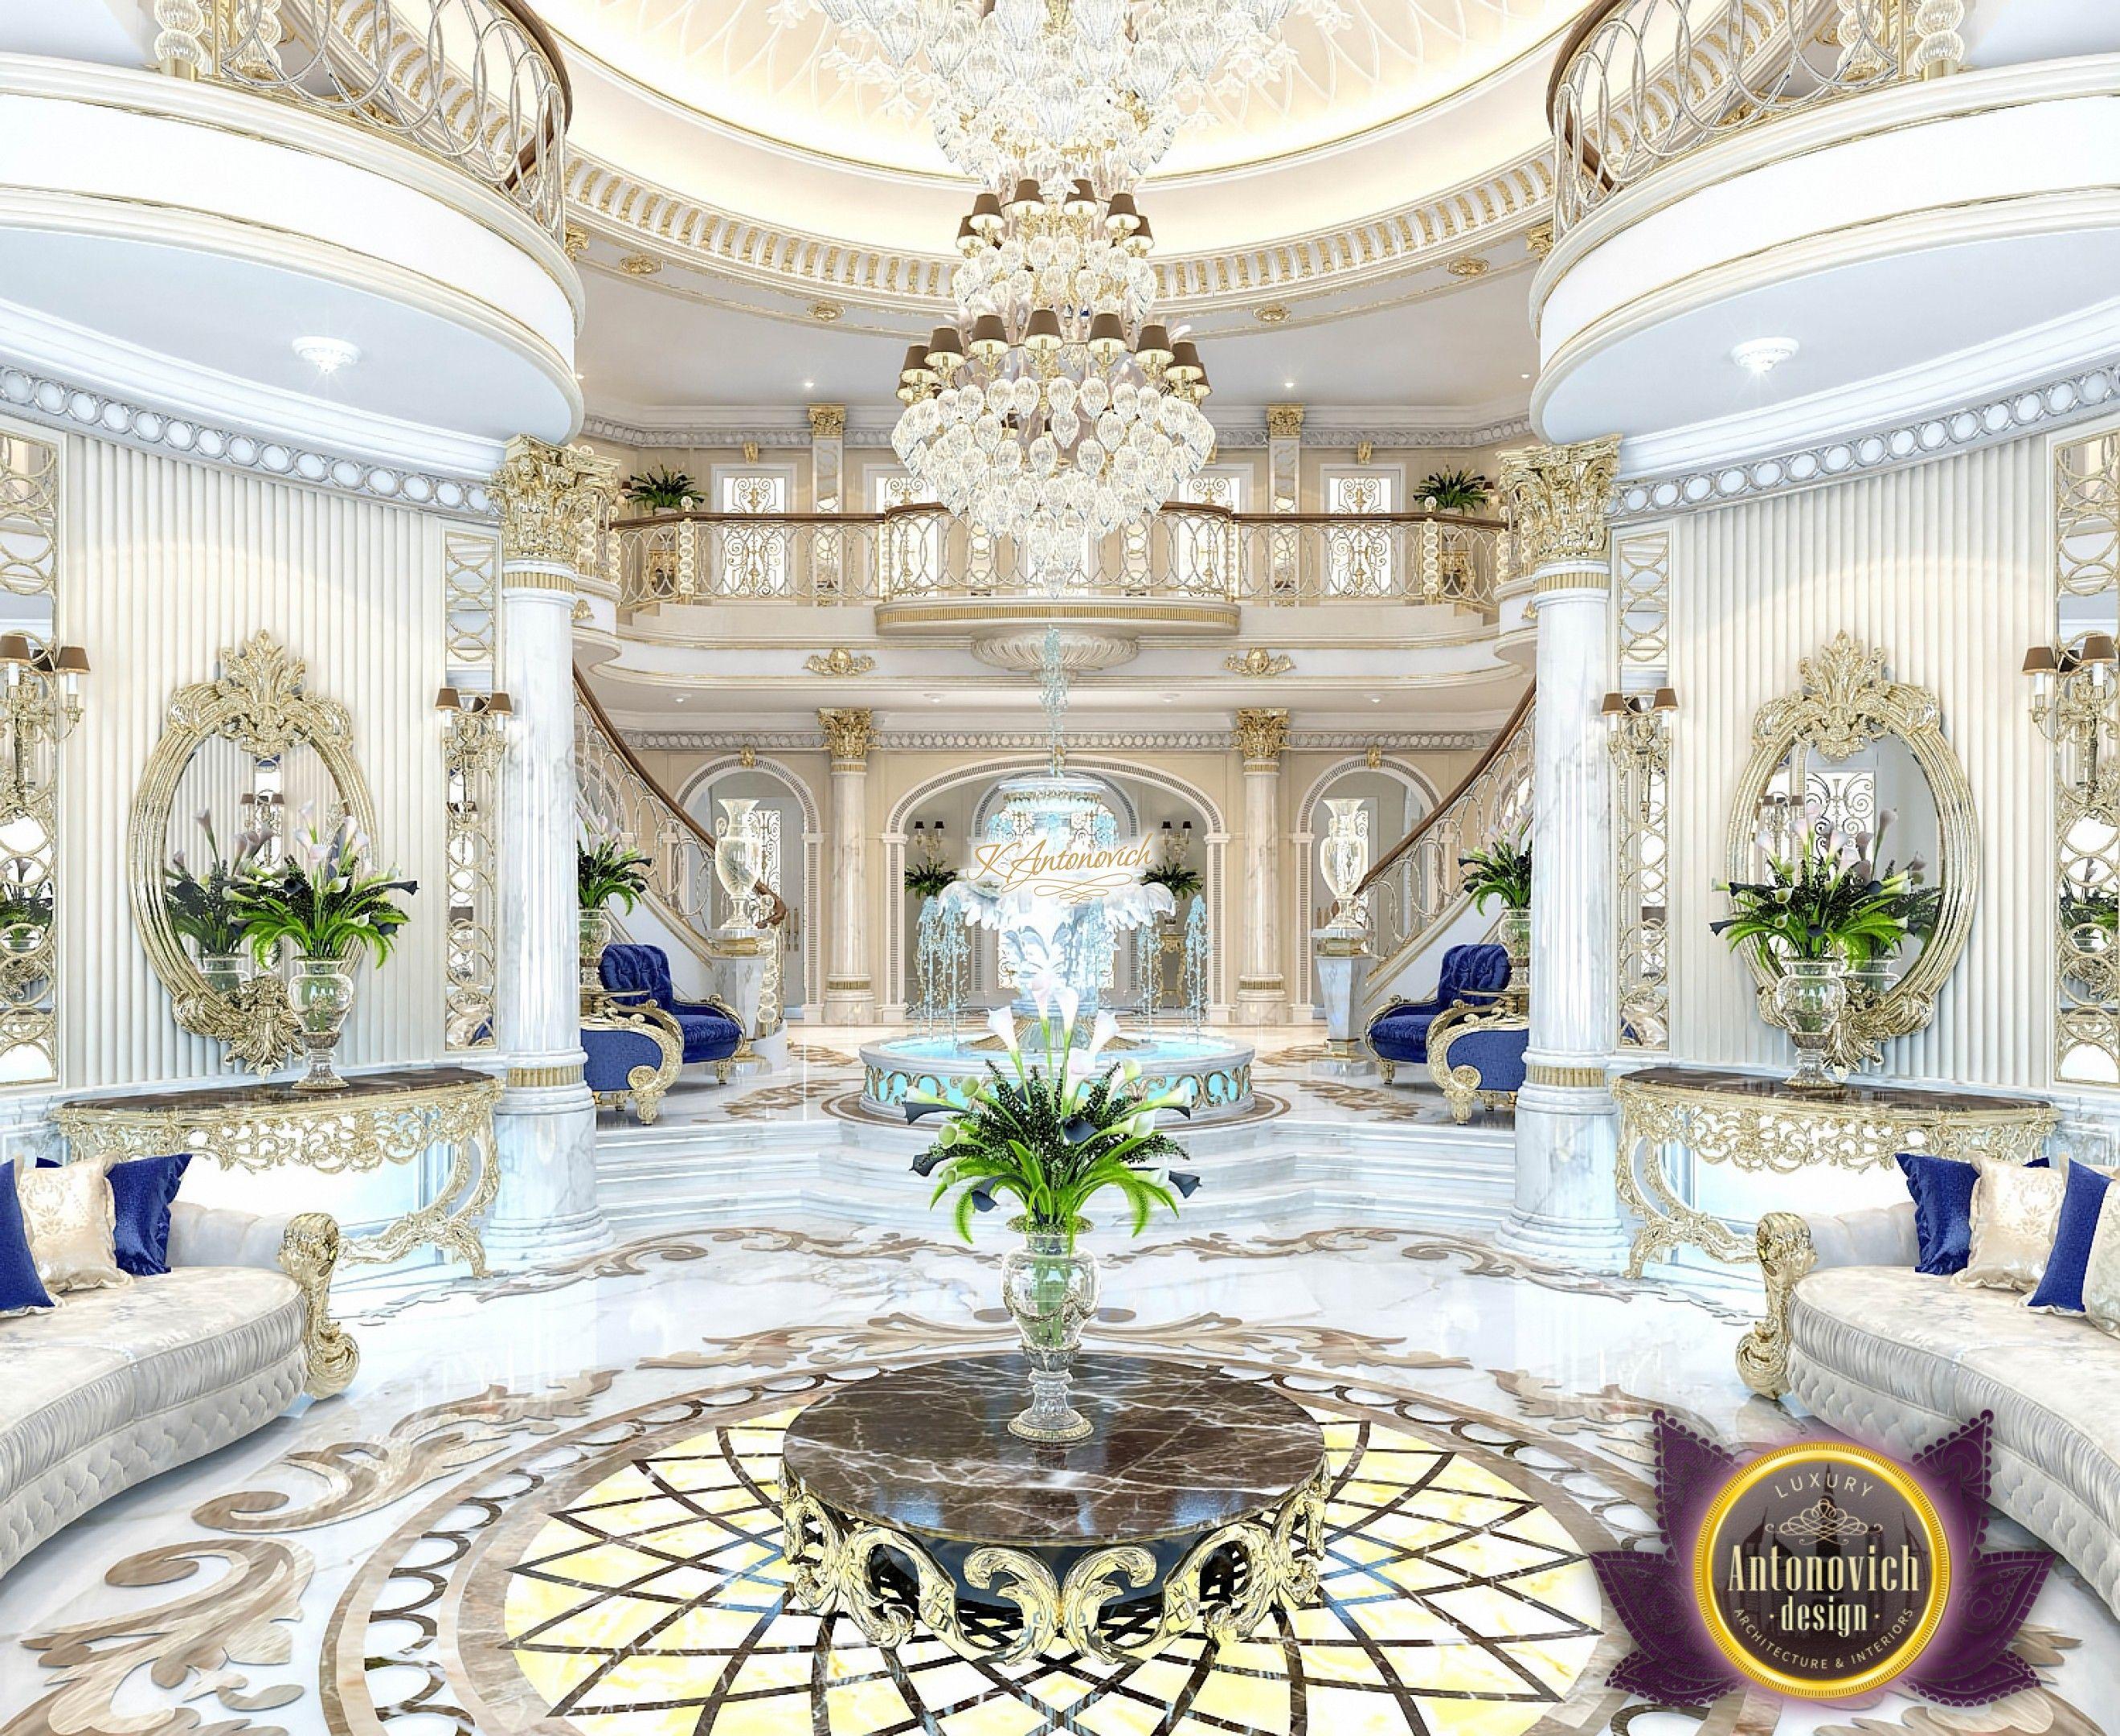 Royal Living Room Interior | Design | Pinterest | Living room ...